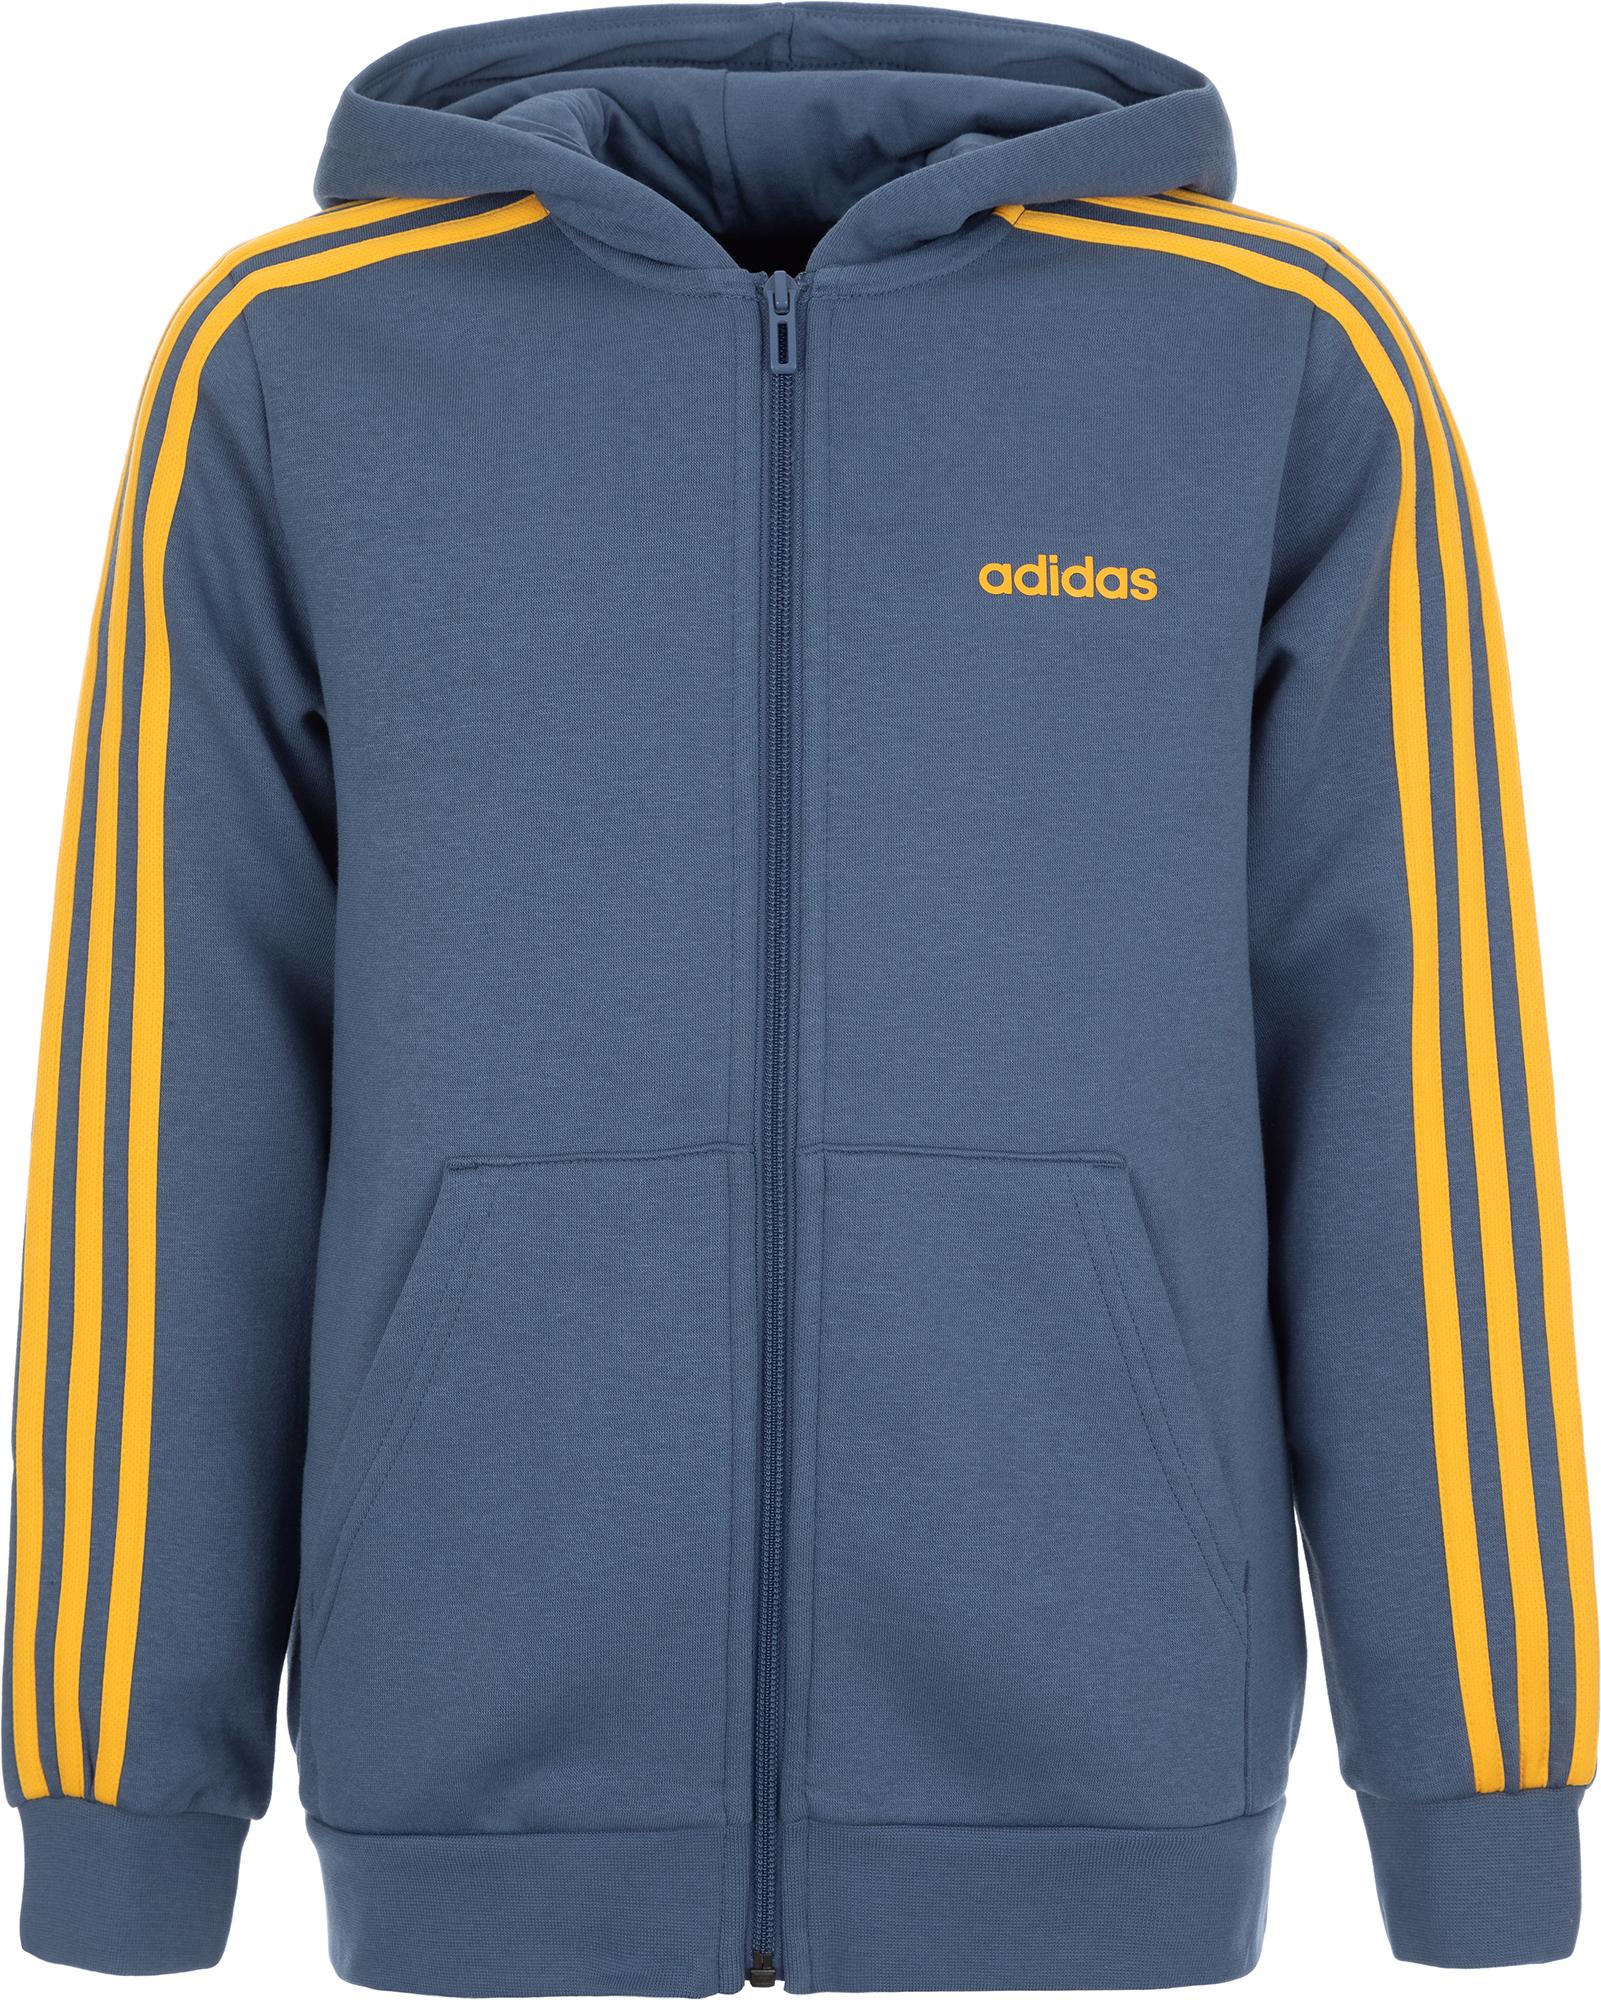 Adidas Толстовка для мальчиков Essentials 3-Stripes, размер 164